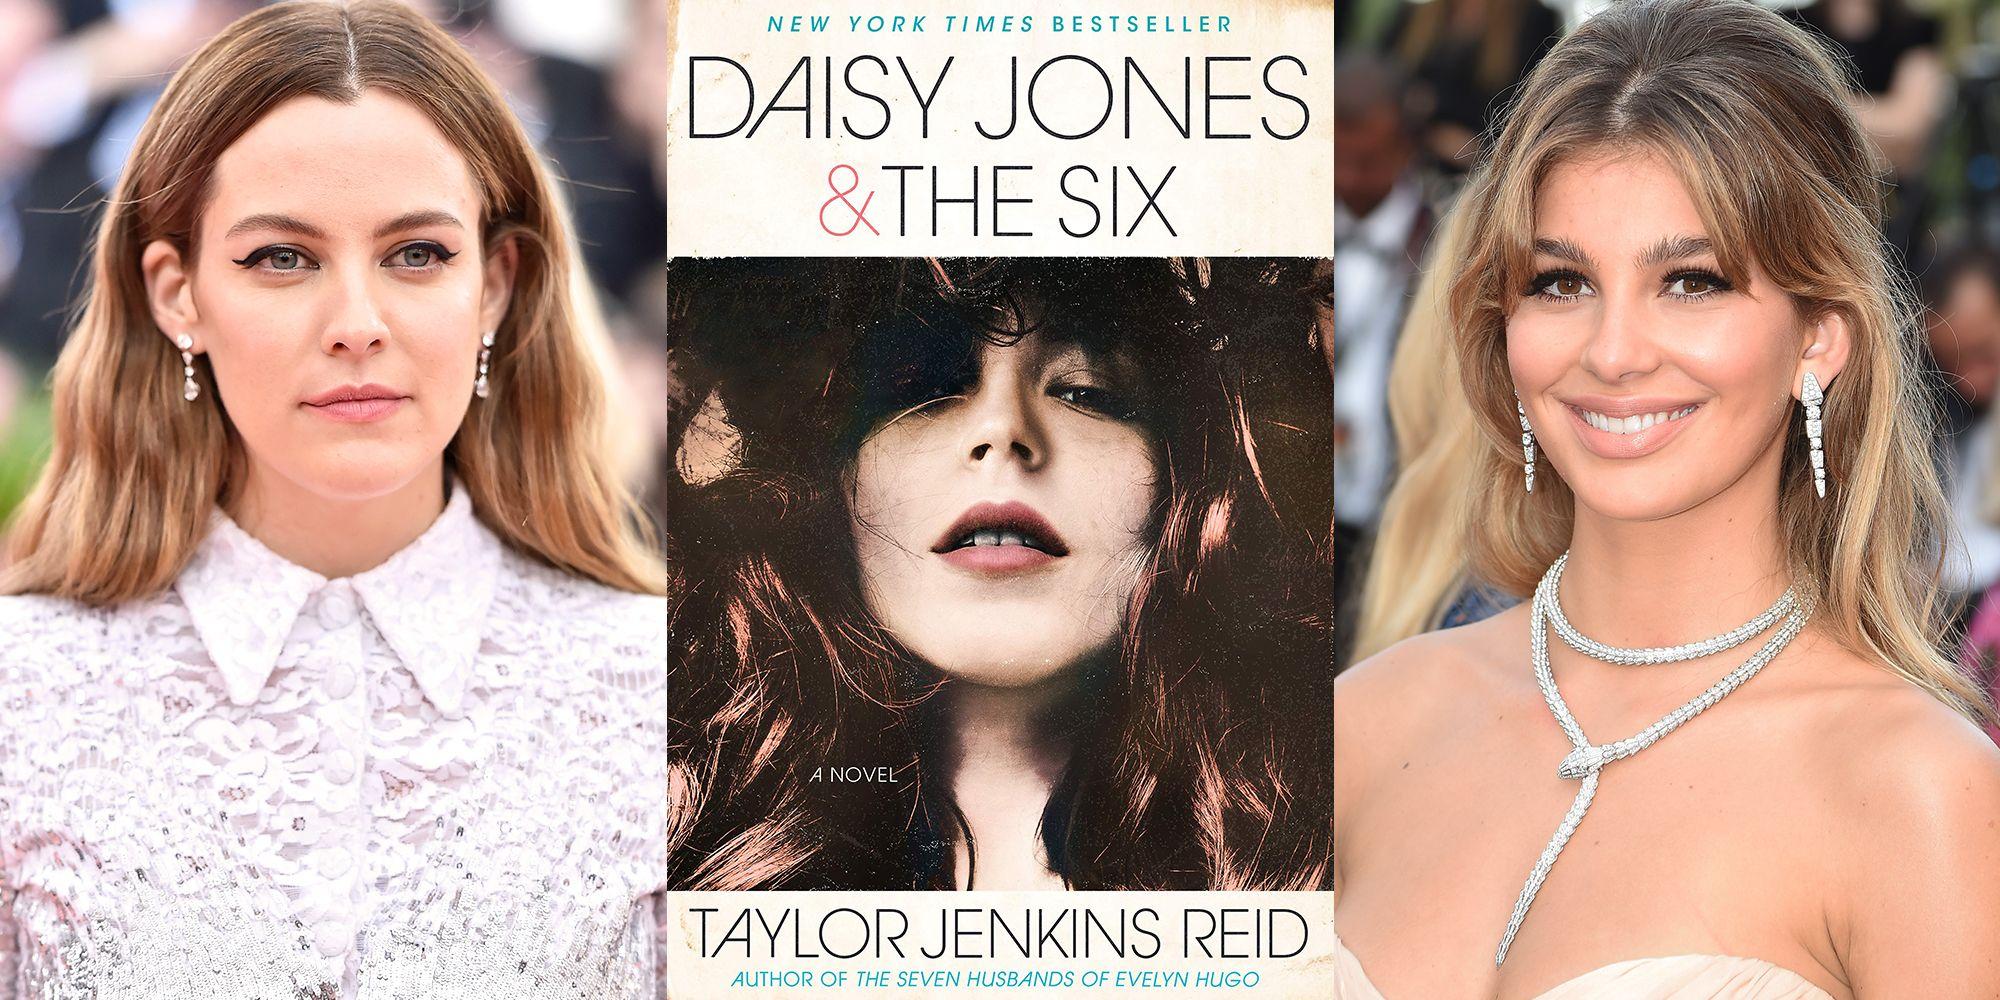 daisy jones and the six band